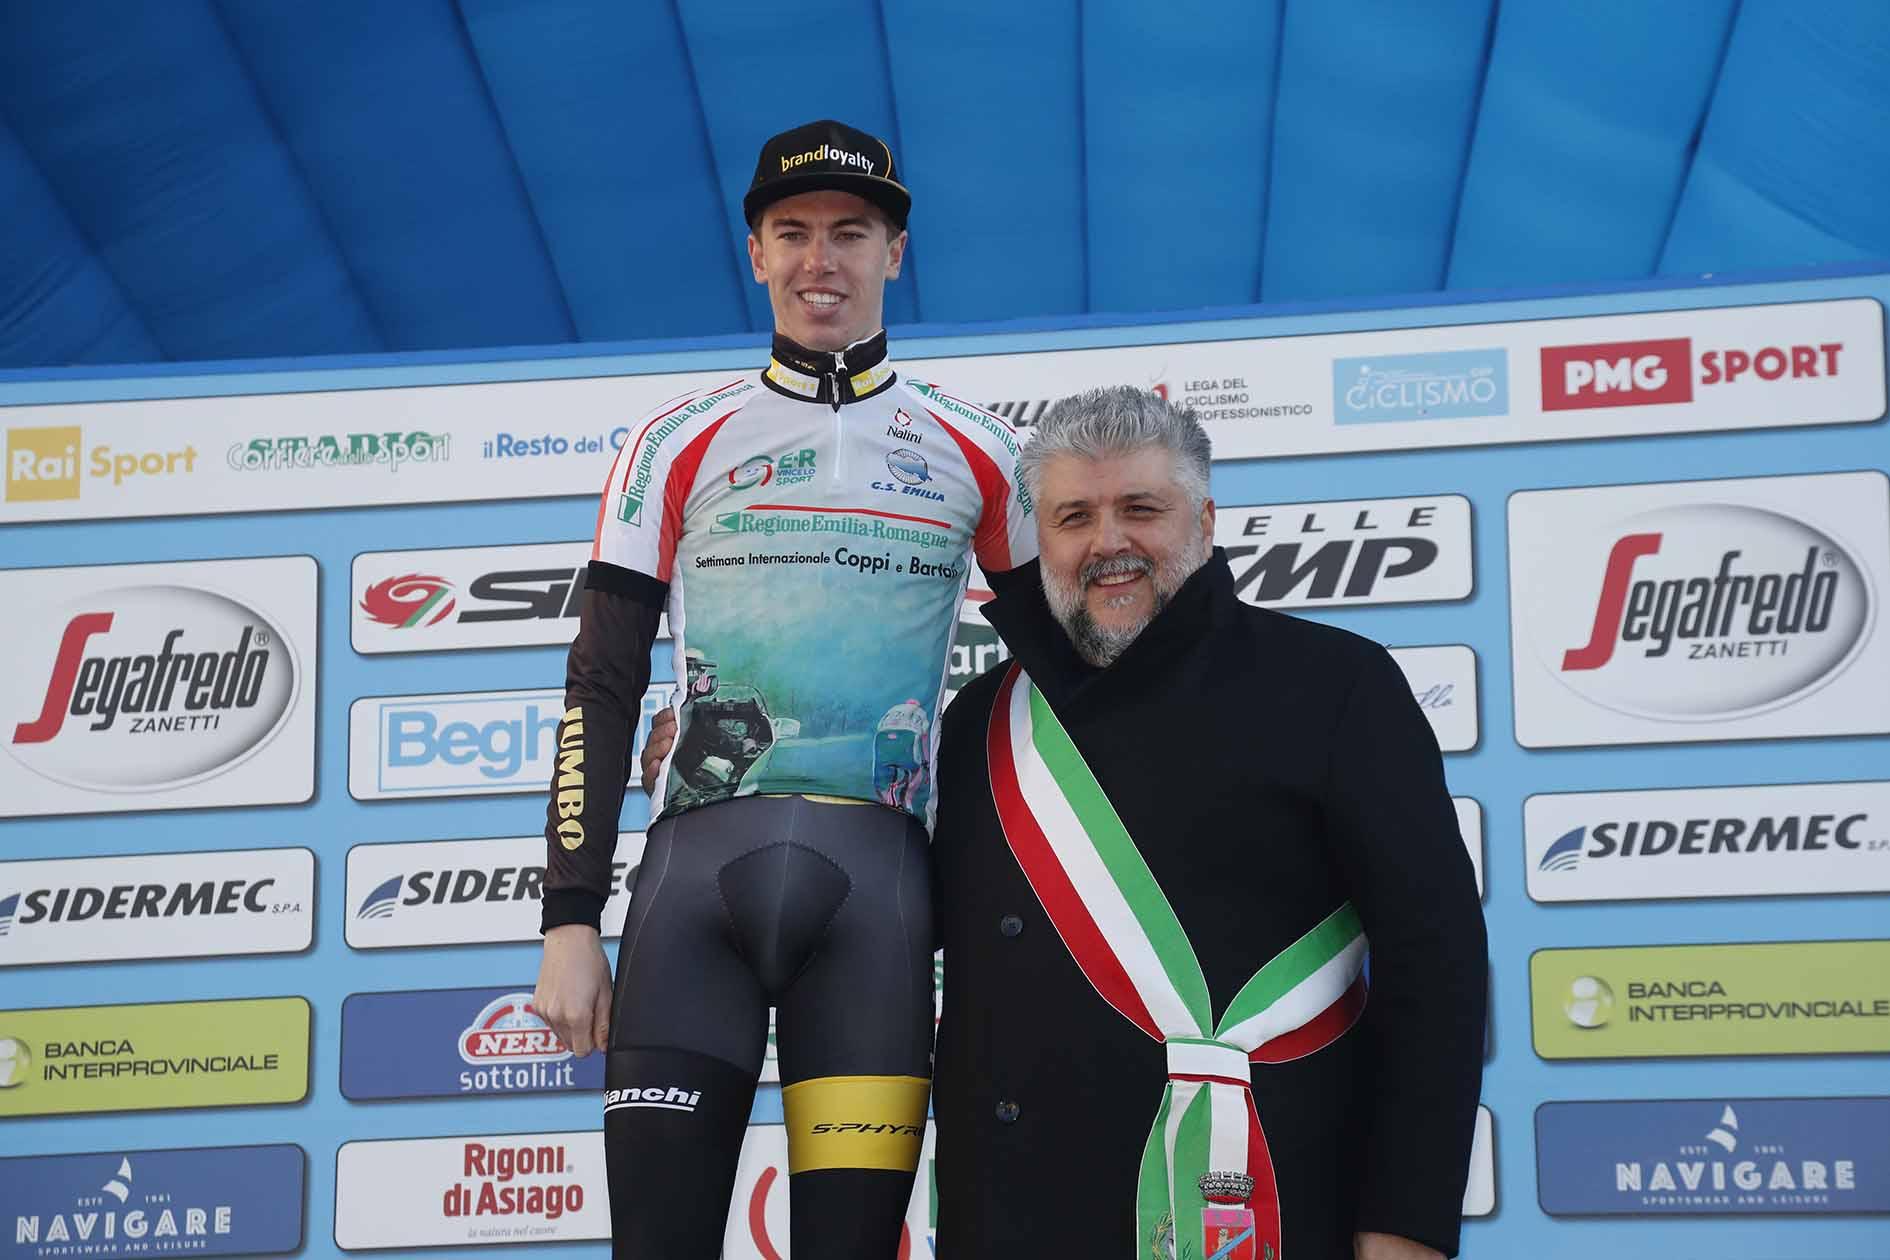 Pascal Eenkhoorn resta leader della Settimana Coppi e Bartali